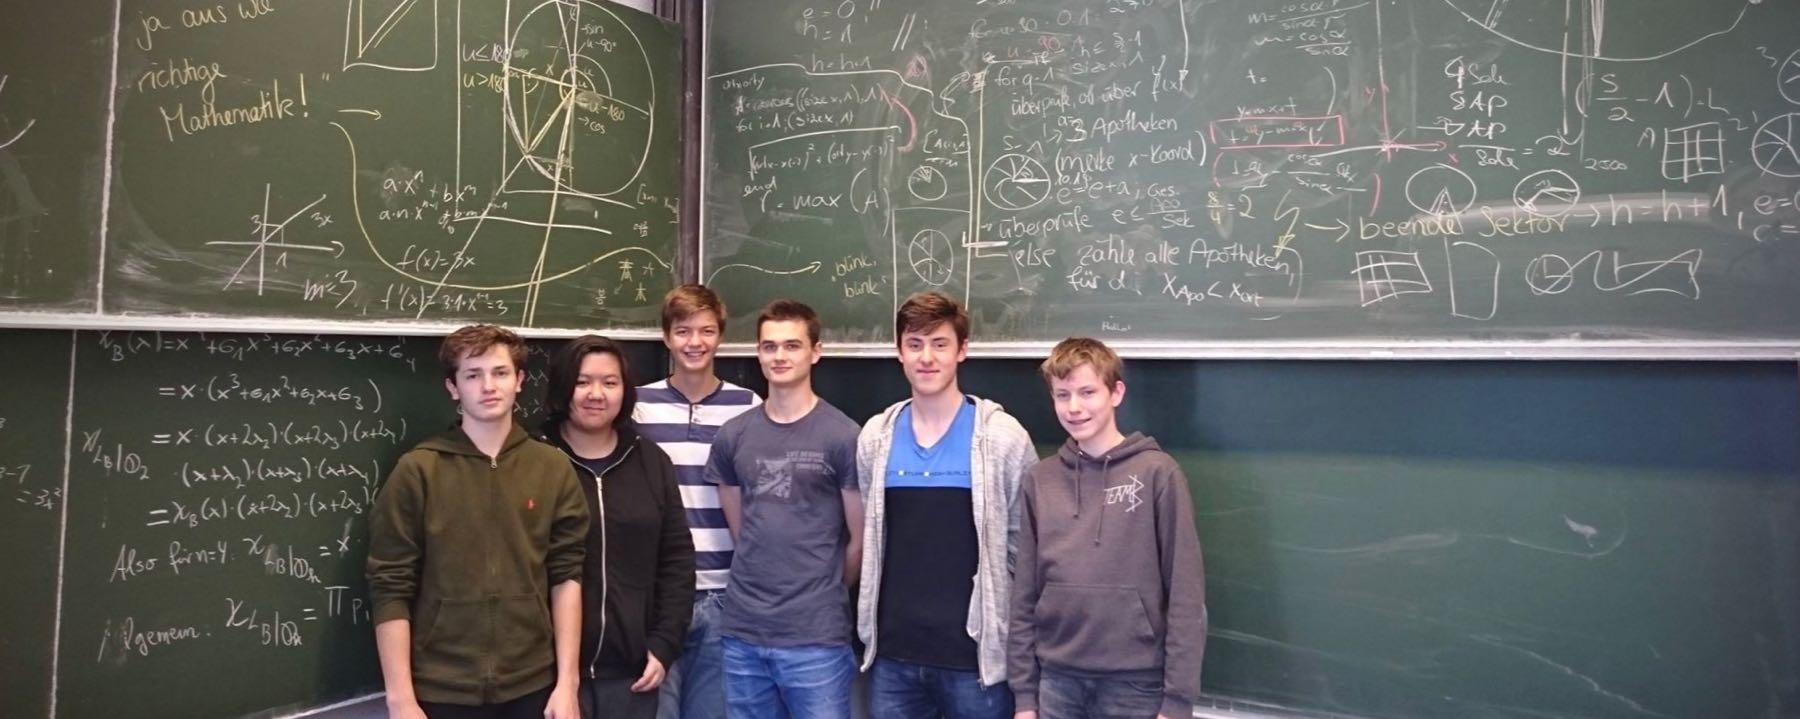 Schüler Optimieren Mit Computern Notfallpläne